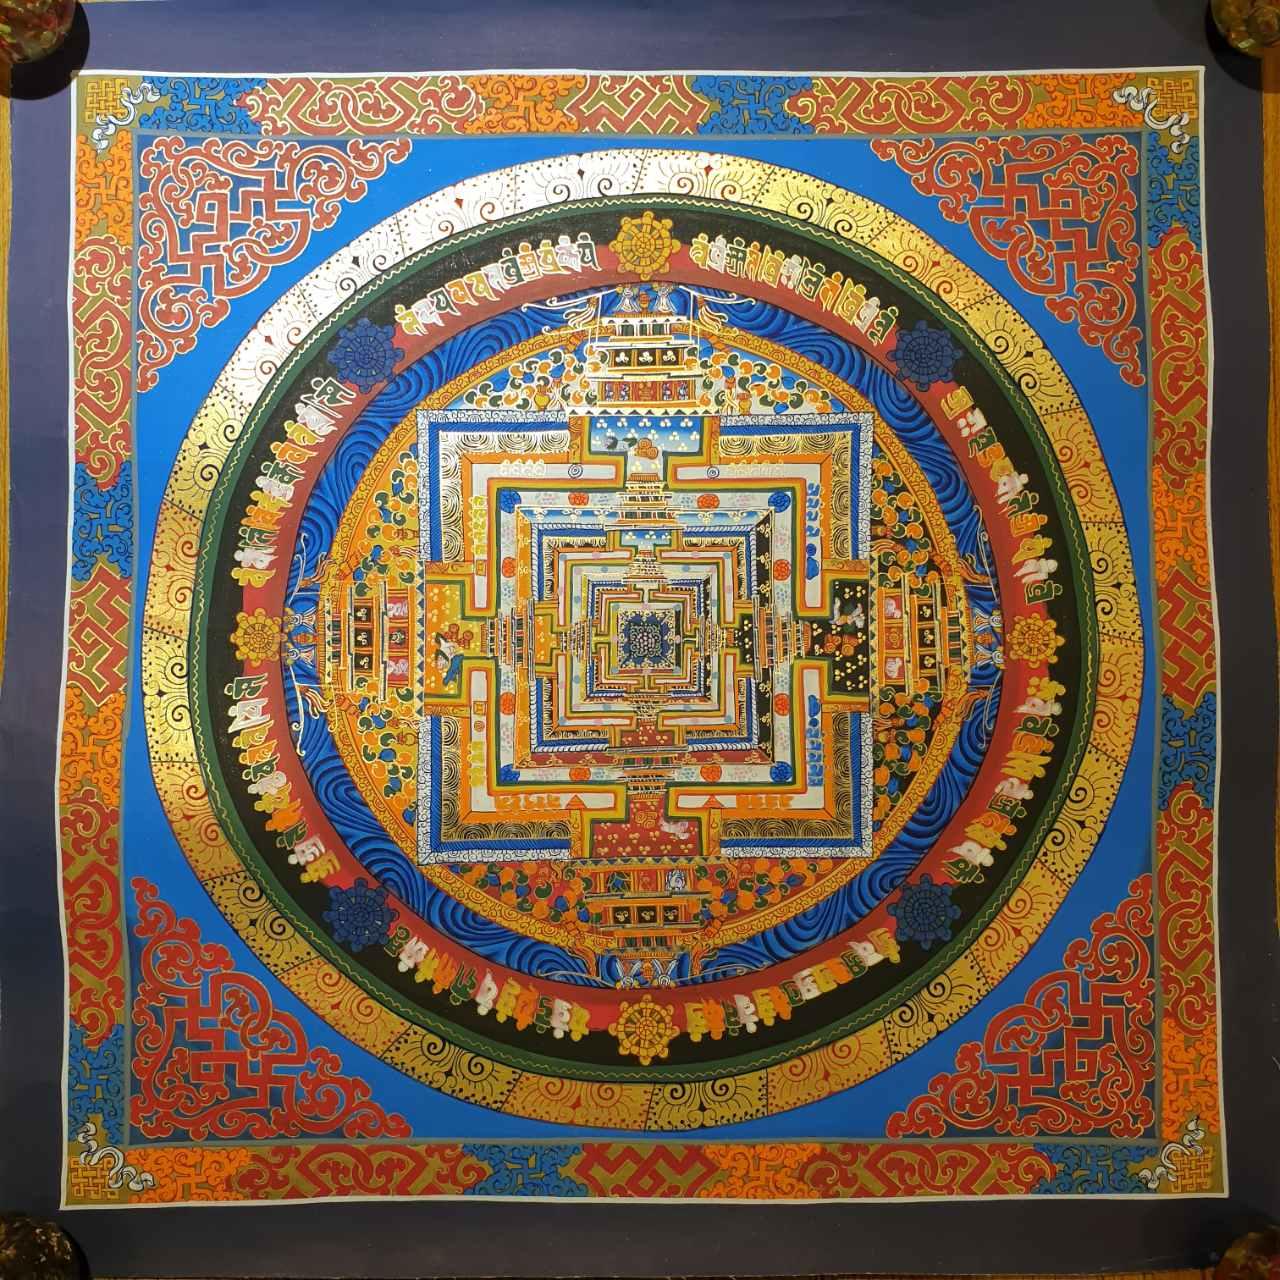 Kalachakra Mandala Thangka Painting Home Decor Wall Art